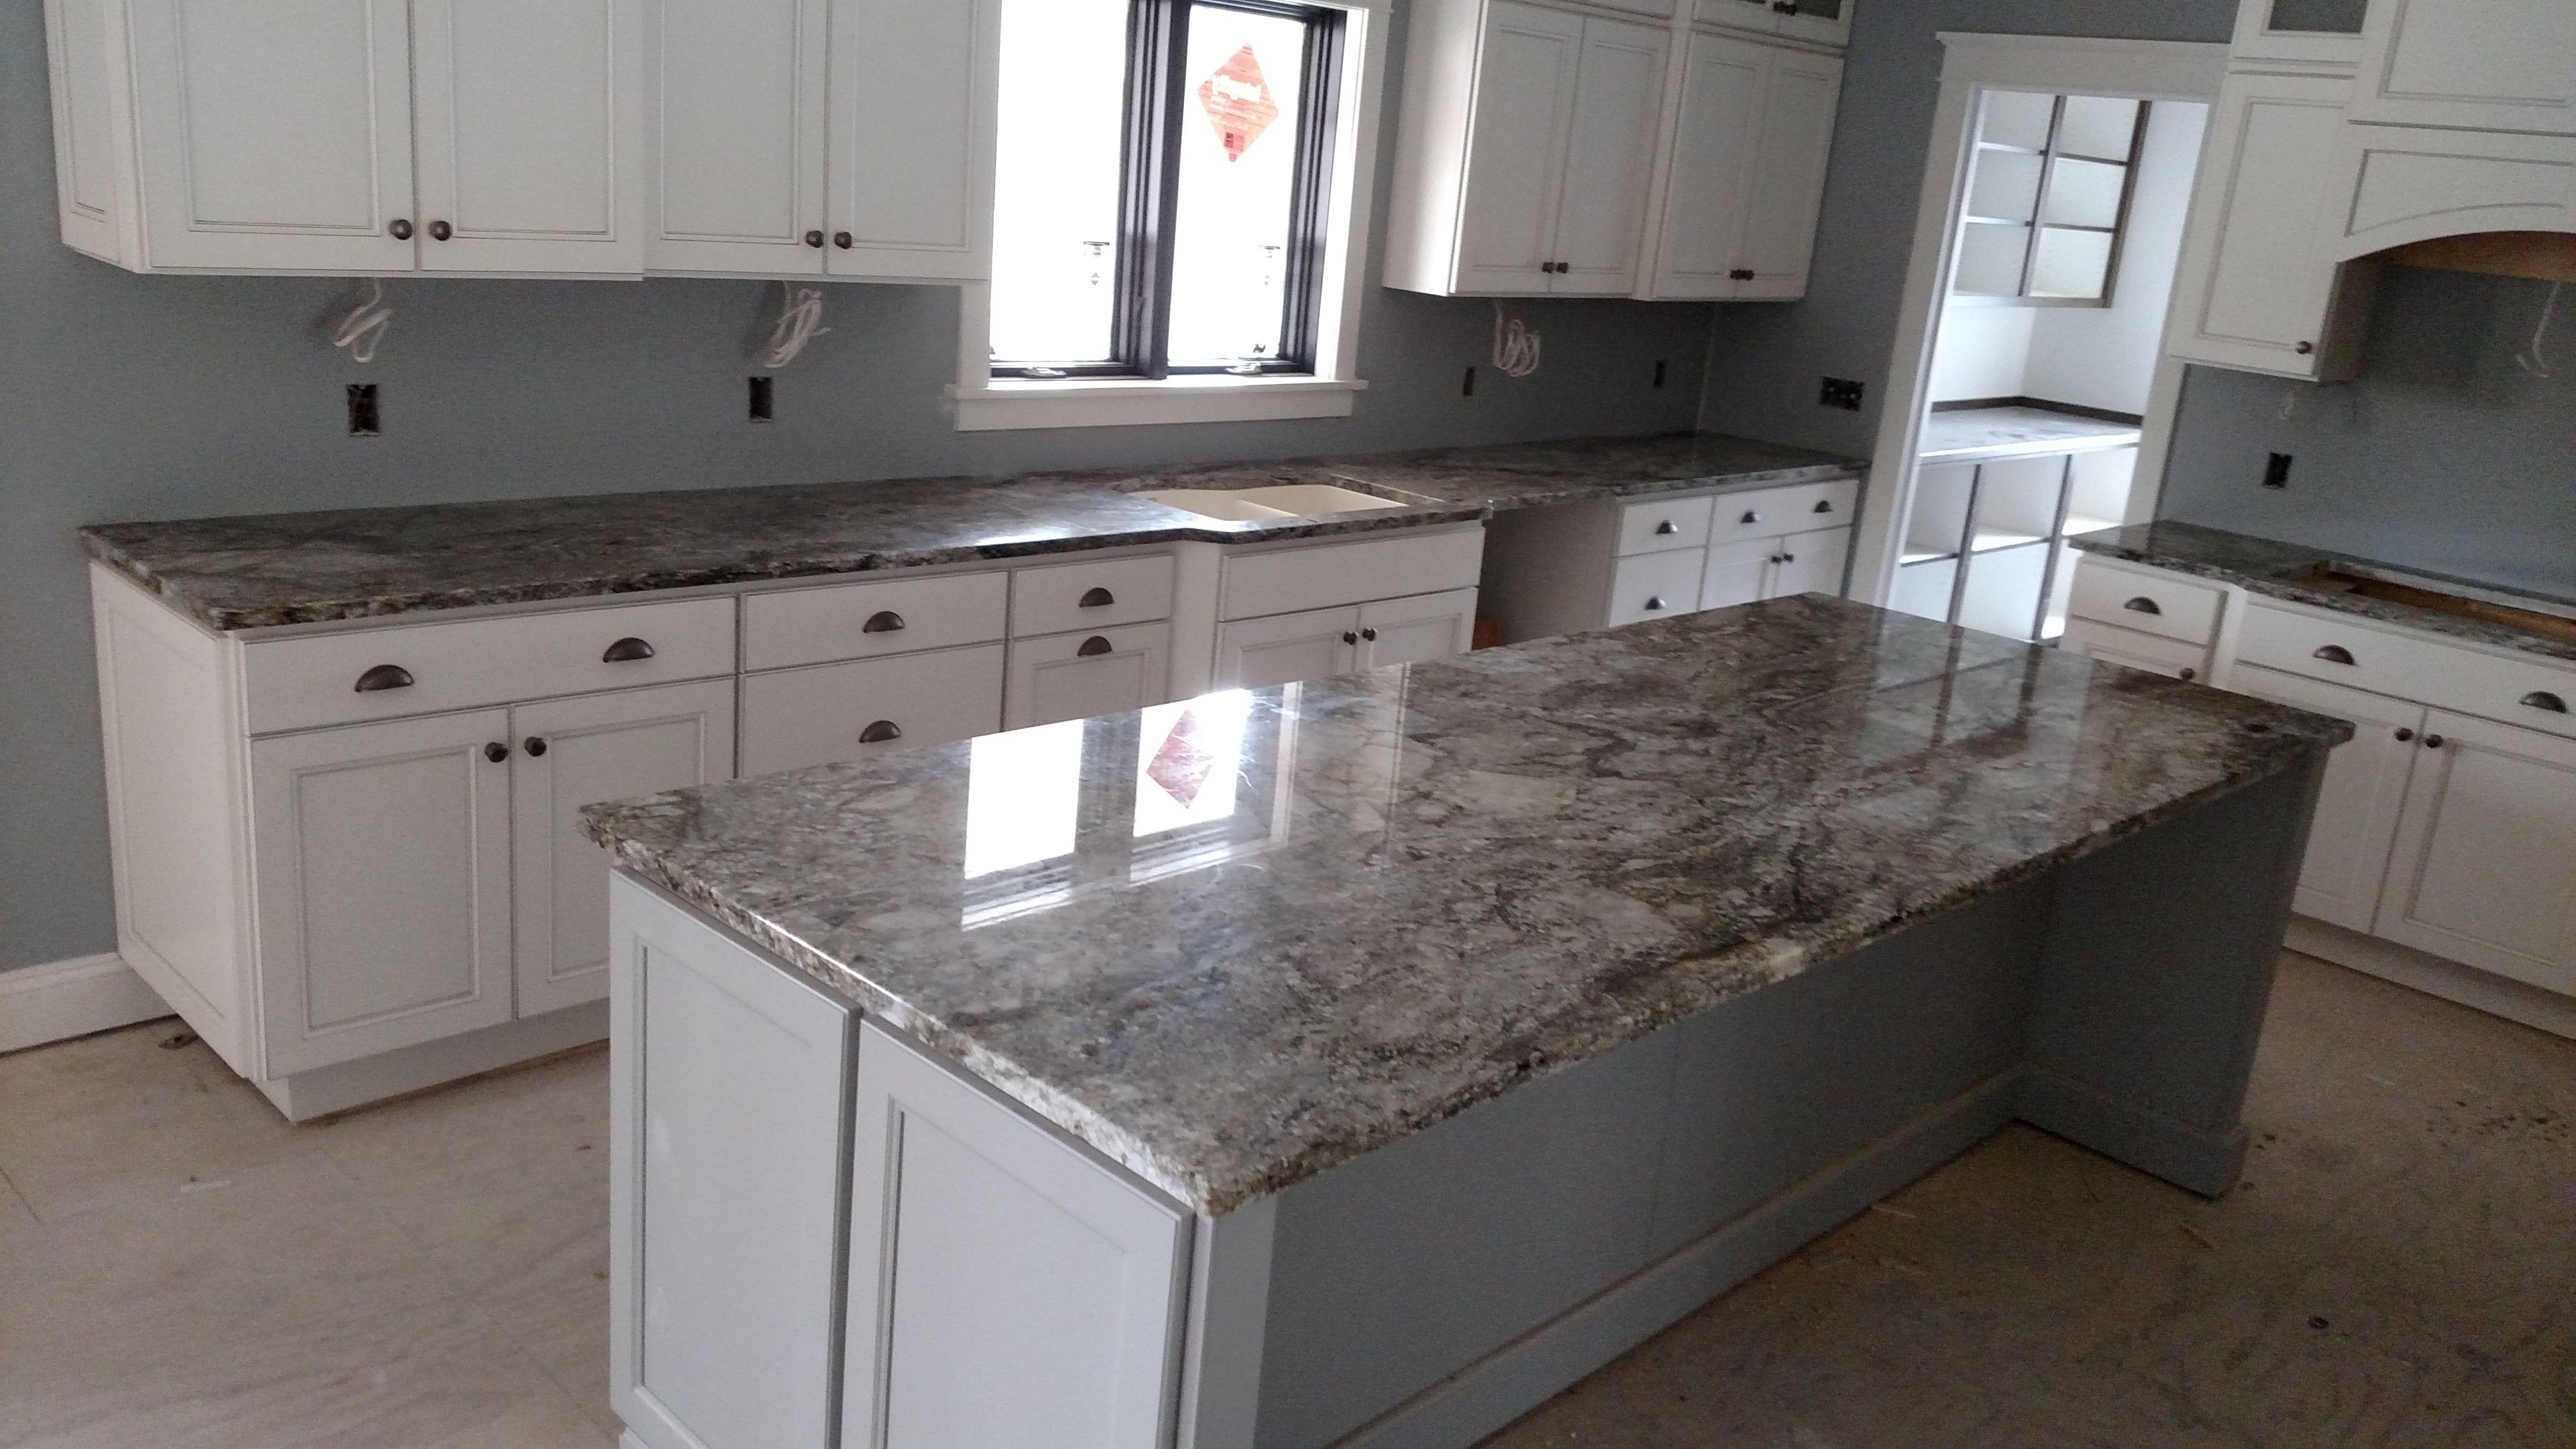 Smokey Mountain Granite Kitchen With White Cabinets Smokeymountaingranite Kitchenremodel White Granite Countertops Granite Kitchen White Kitchen Cabinets